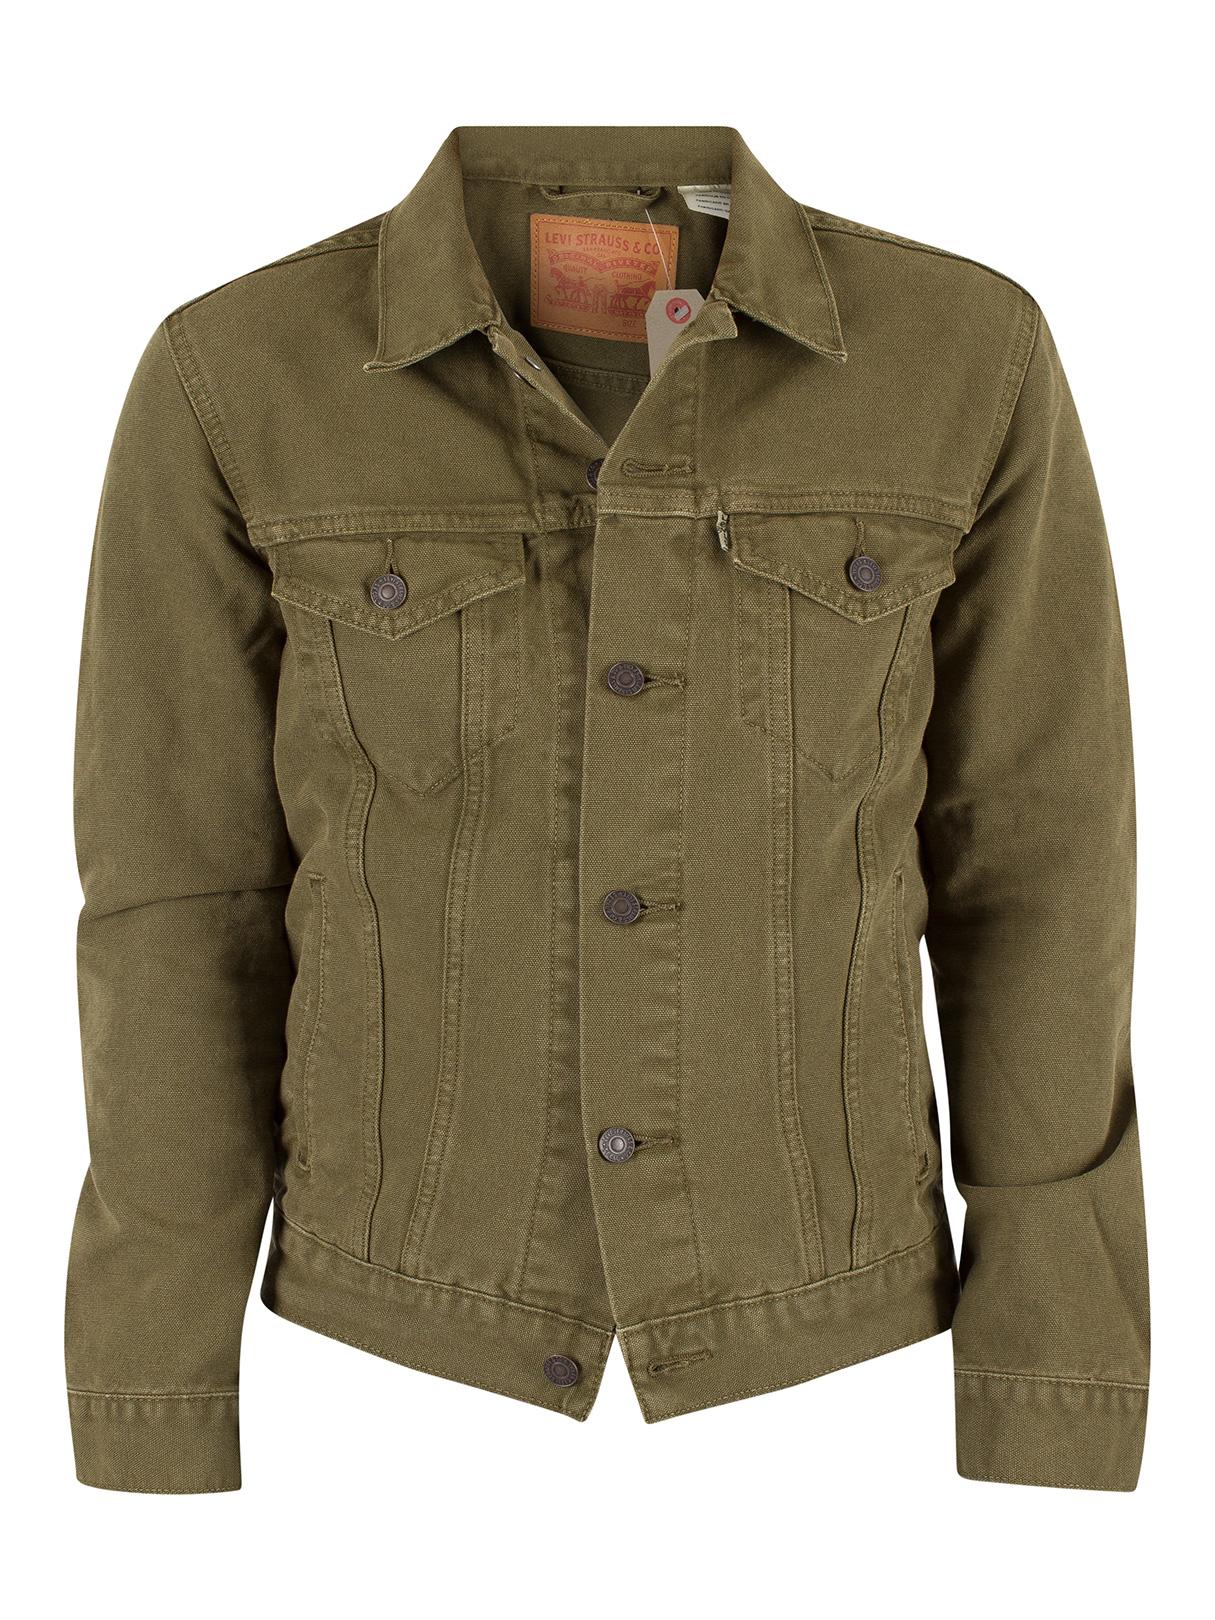 Leviu0026#39;s Menu0026#39;s Trucker Foxtrot Denim Jacket Green | eBay